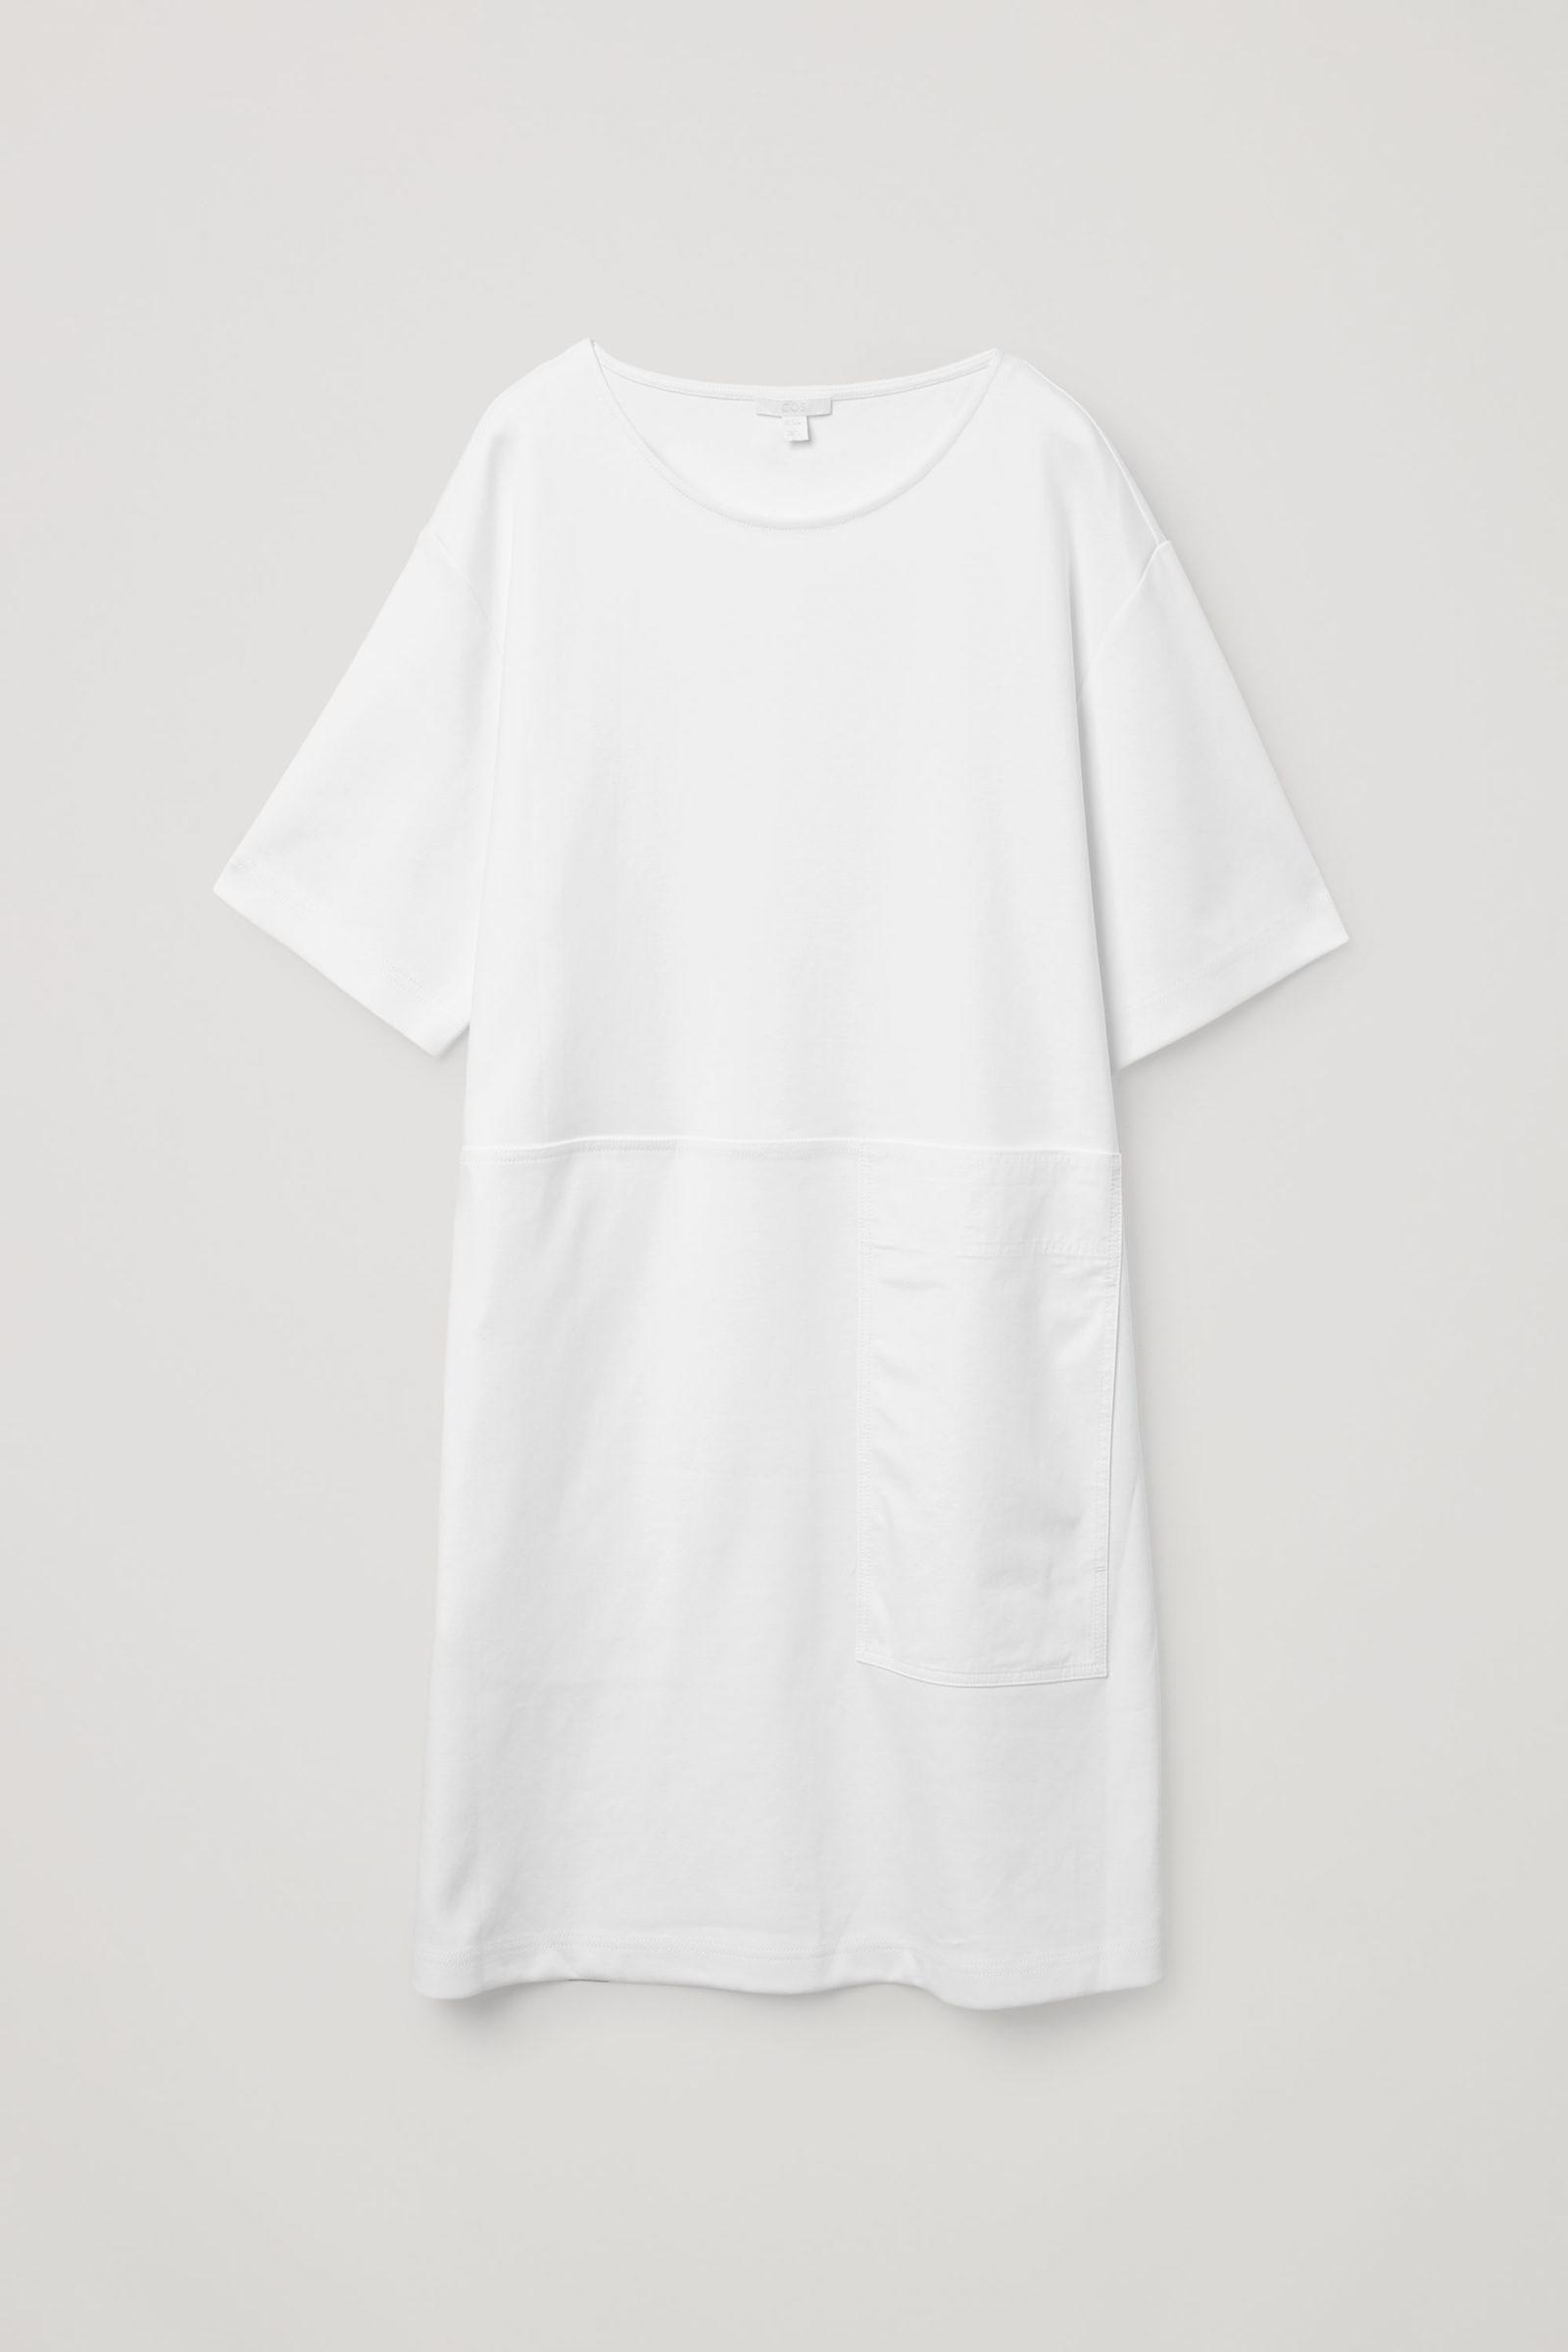 COS 포켓 디테일 코튼 드레스의 화이트컬러 Product입니다.